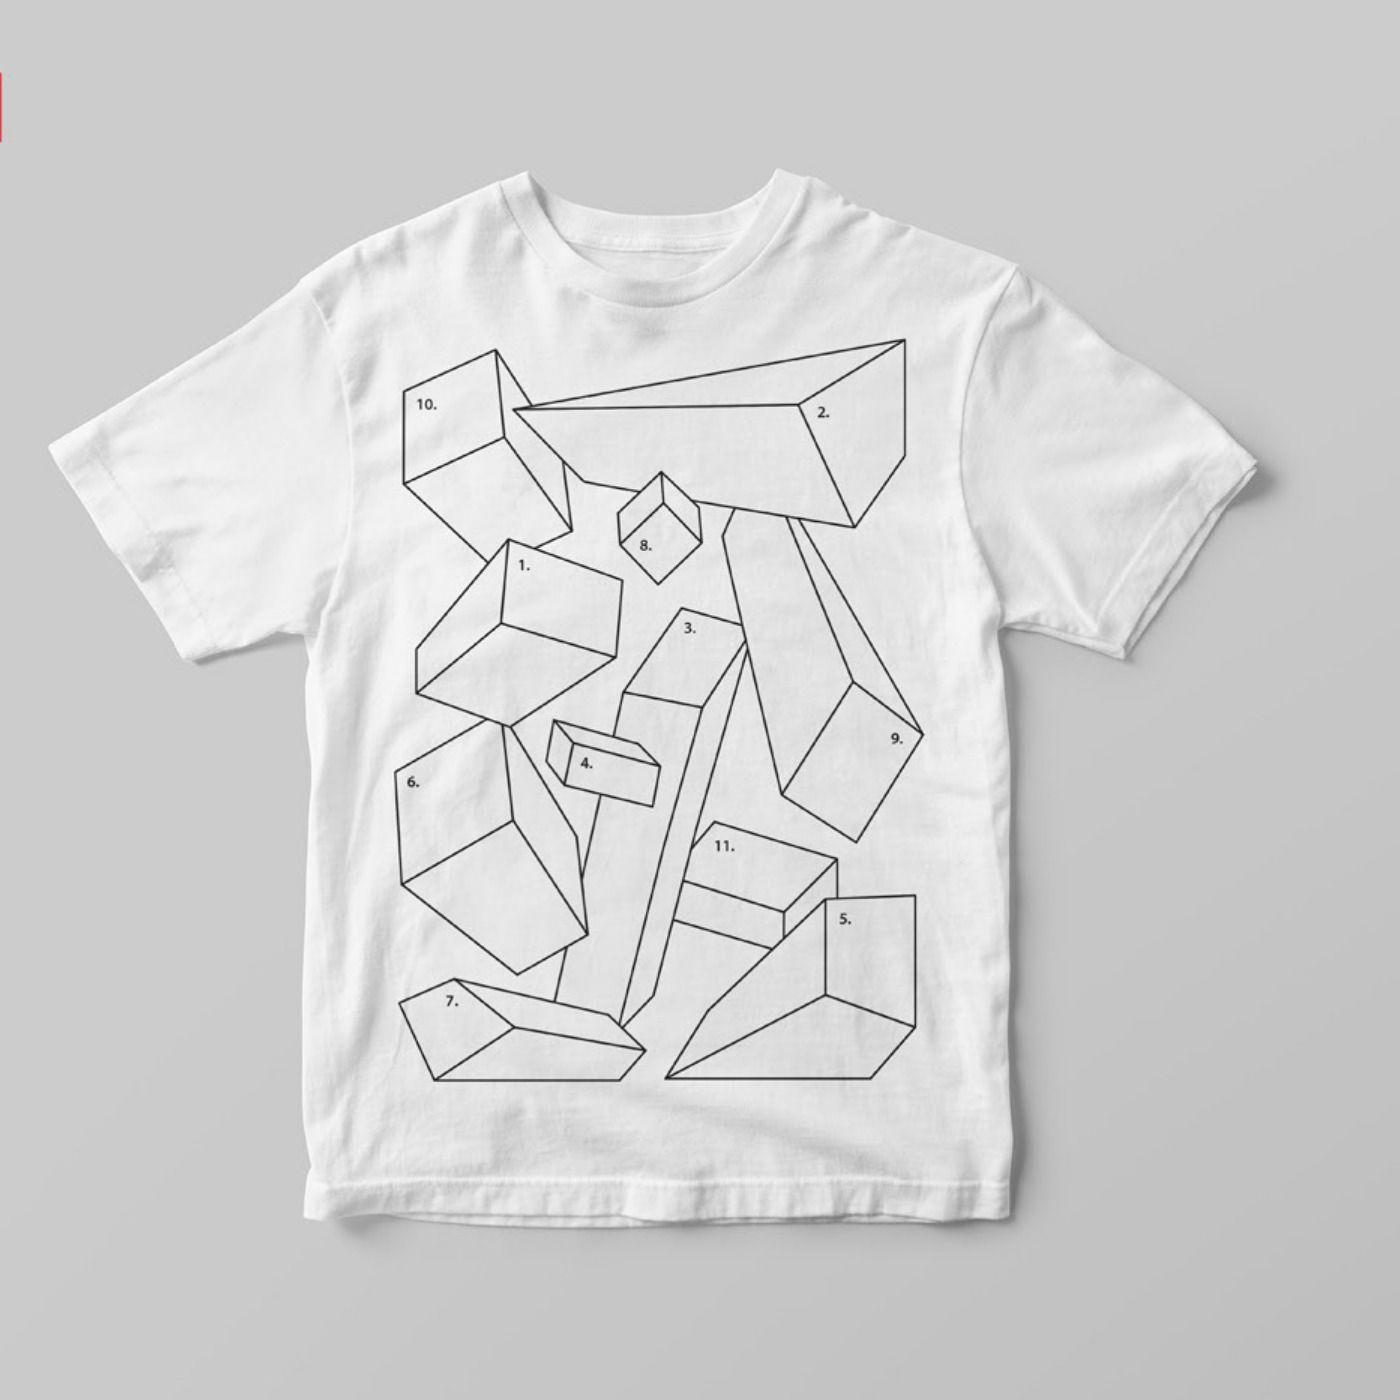 Download Free T Shirt Mockup Shirt Mockup Tshirt Mockup Graphic Design Freebies